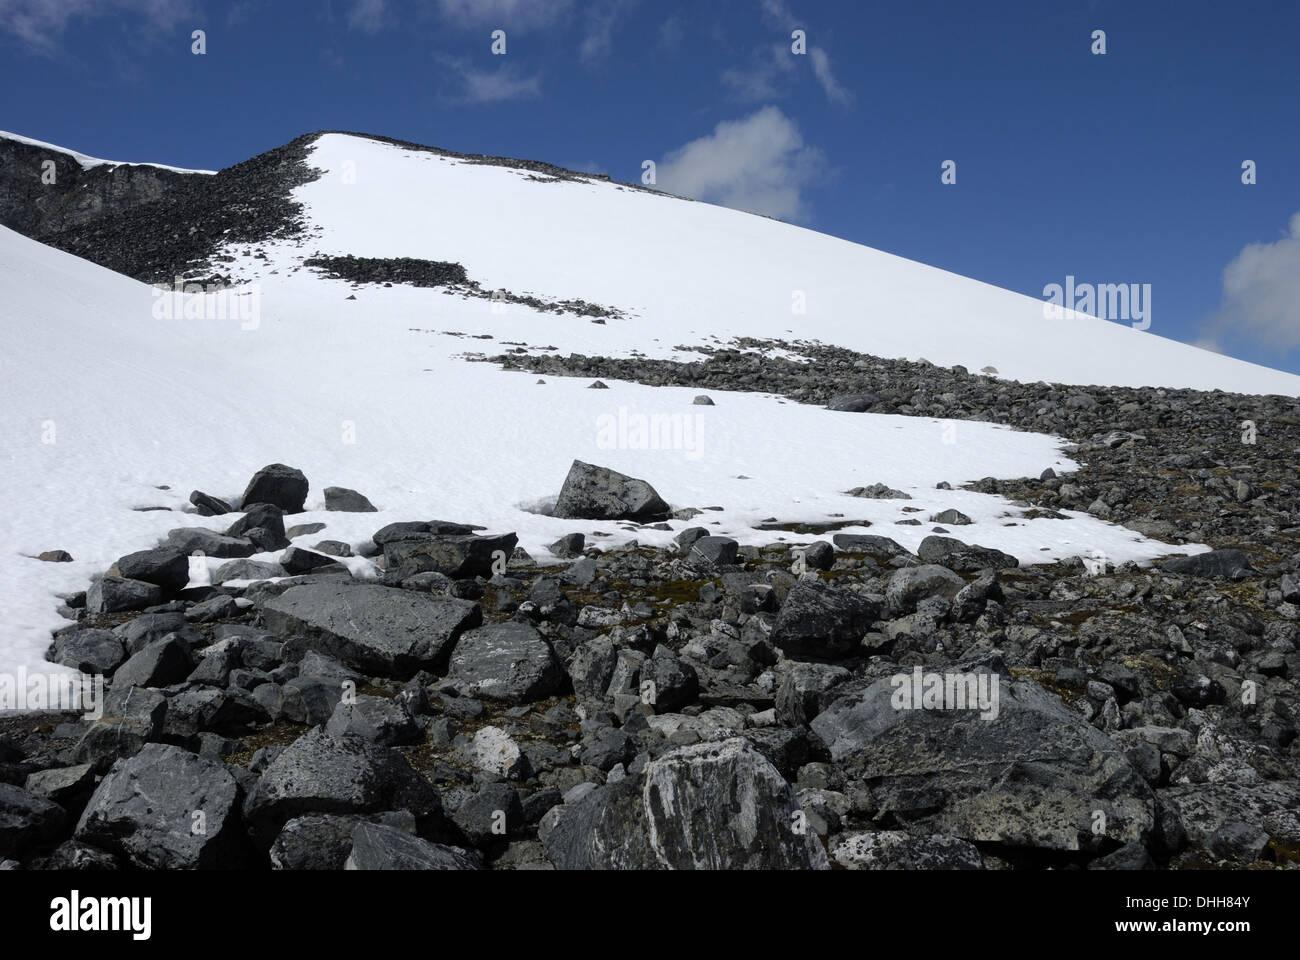 Mountain in Jotunheimen National Park - Stock Image